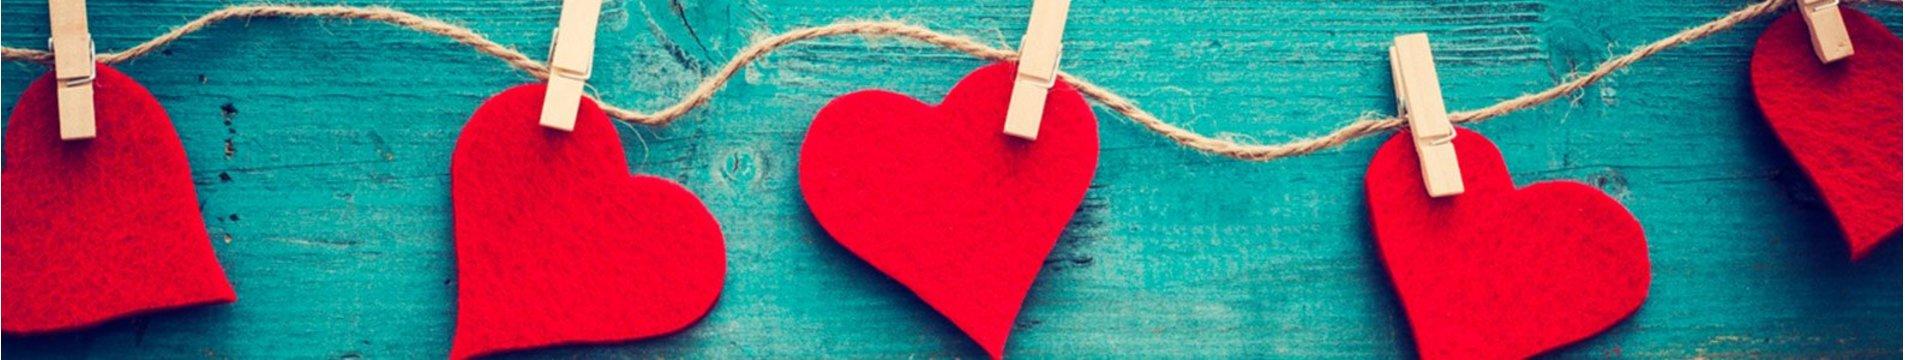 valentines-day-personas-thumb.jpg